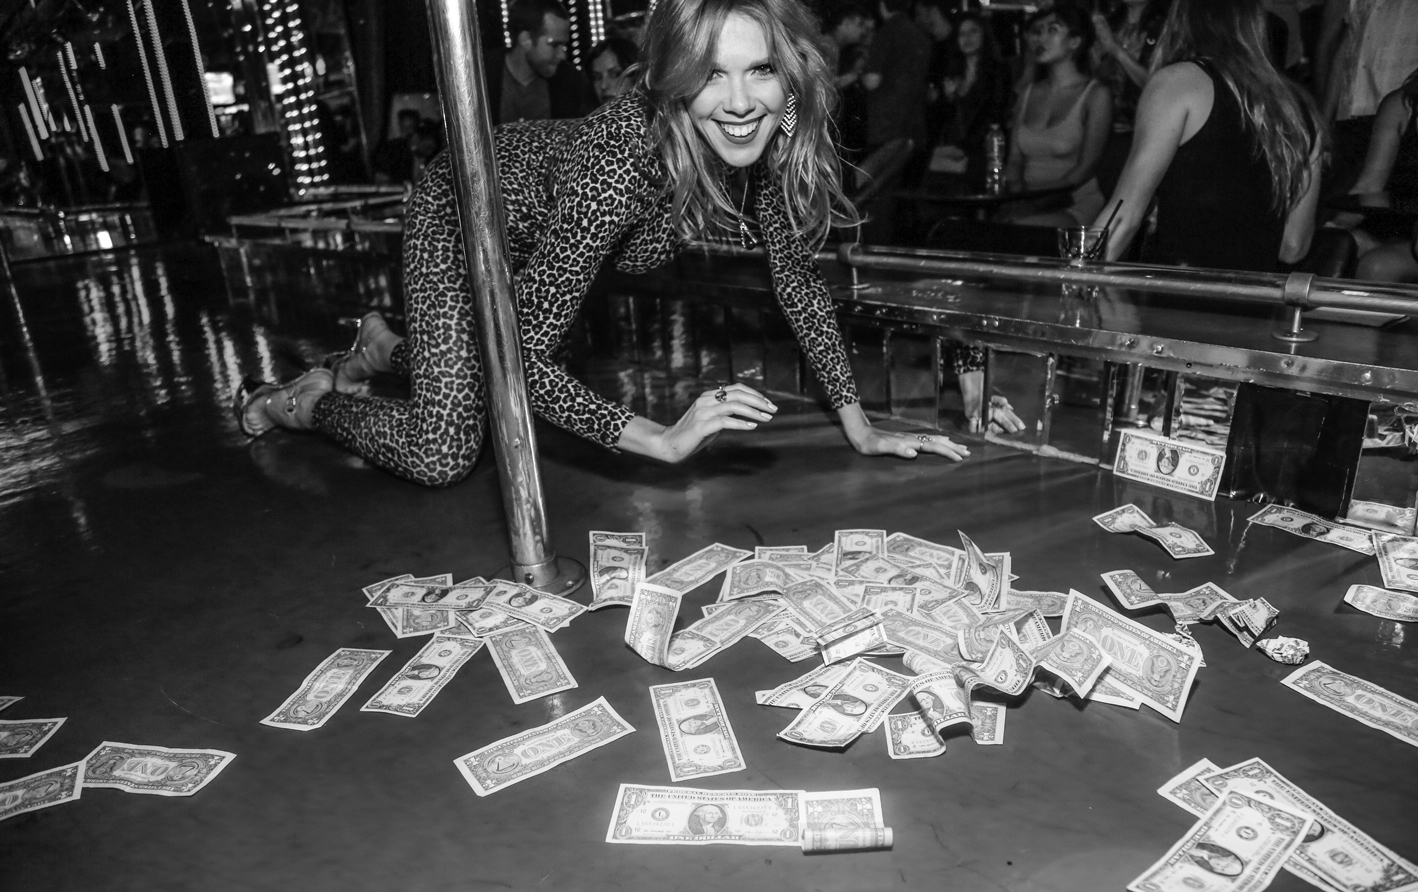 ANTIGRAVITY-OCTOBER-2017-Jacq-The-Stripper-Photo-by-Rachel-Lena-Esterline